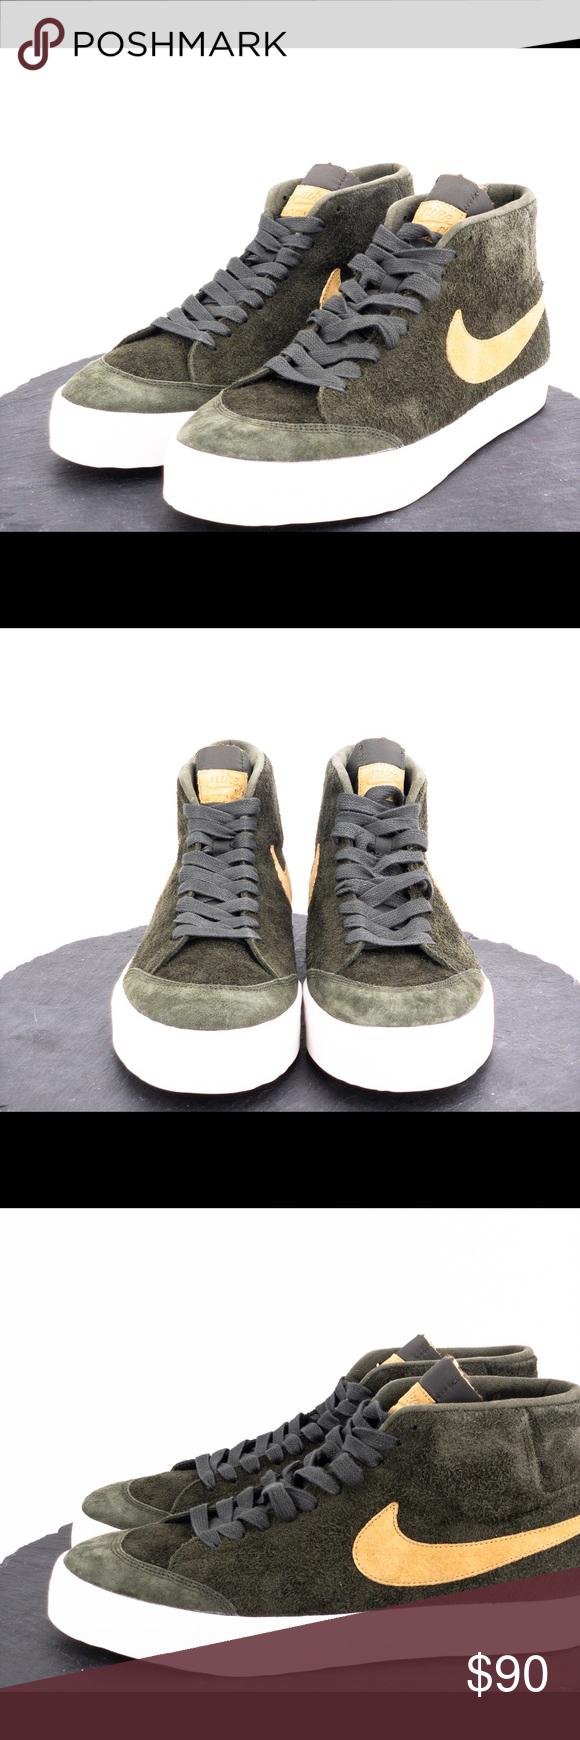 reputable site 0c5e7 1b070 Nike SB Zoom Blazer x We Club 58 mens The product you are ...